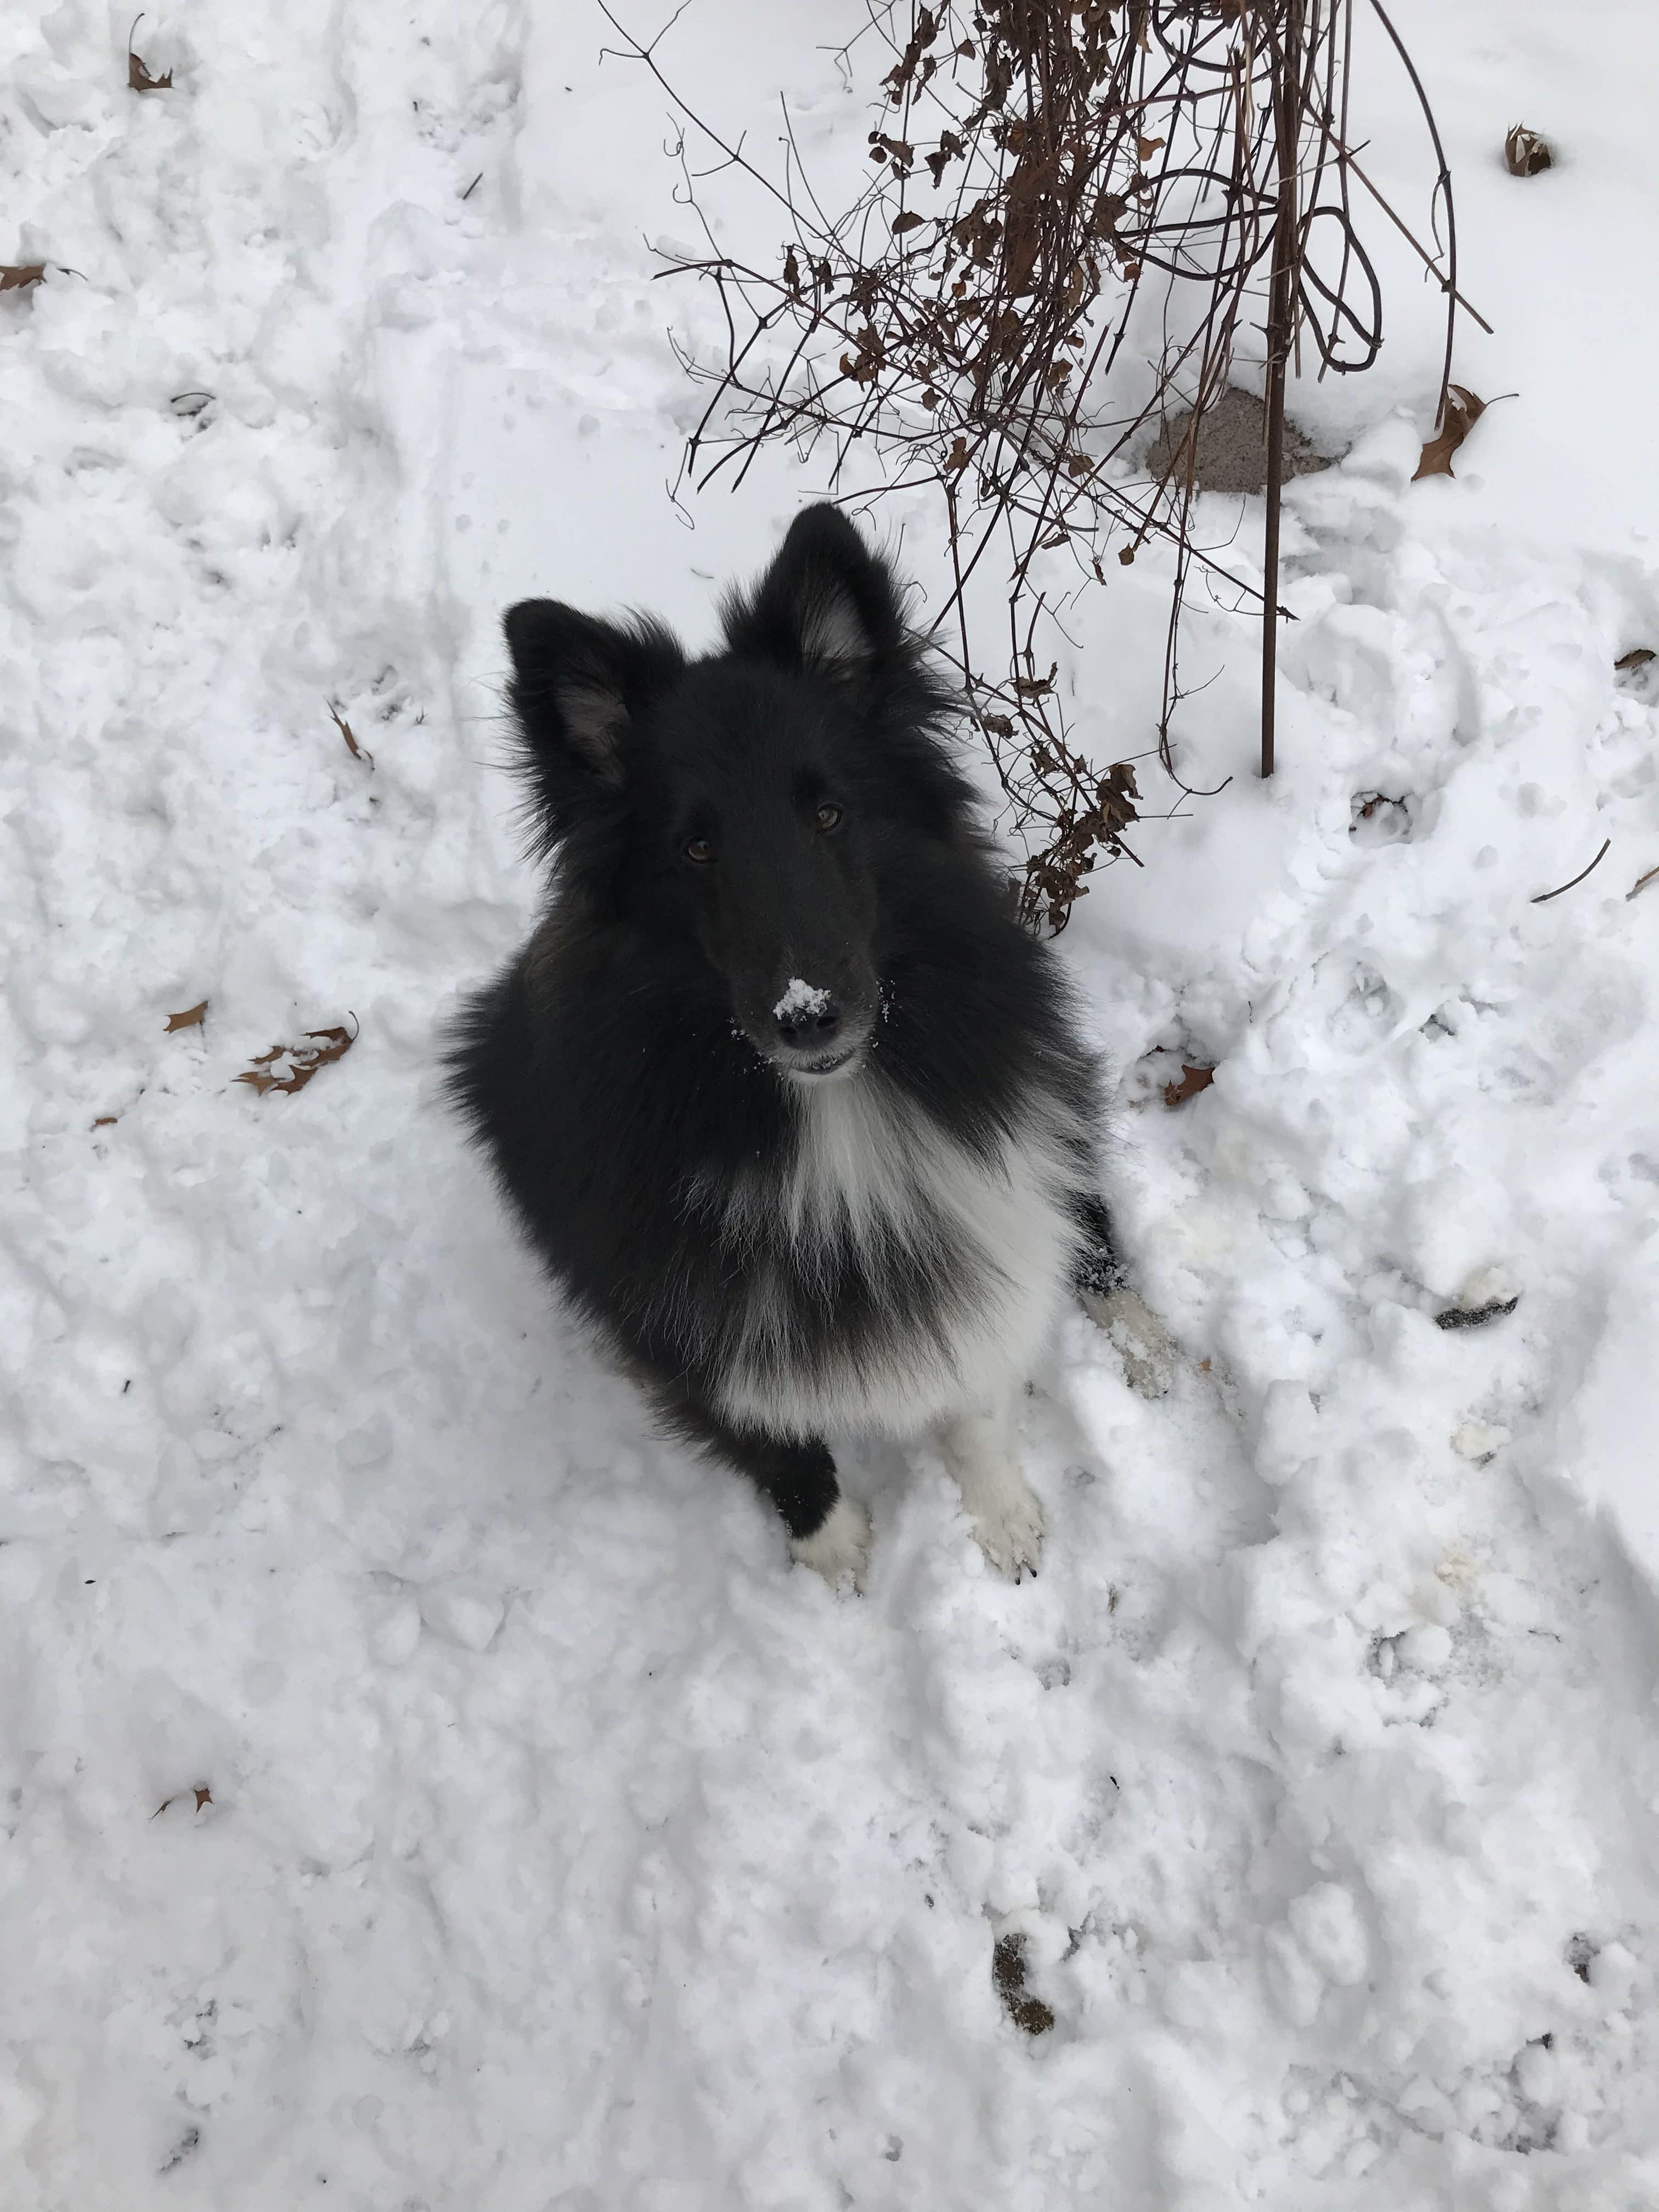 asha loves the snow